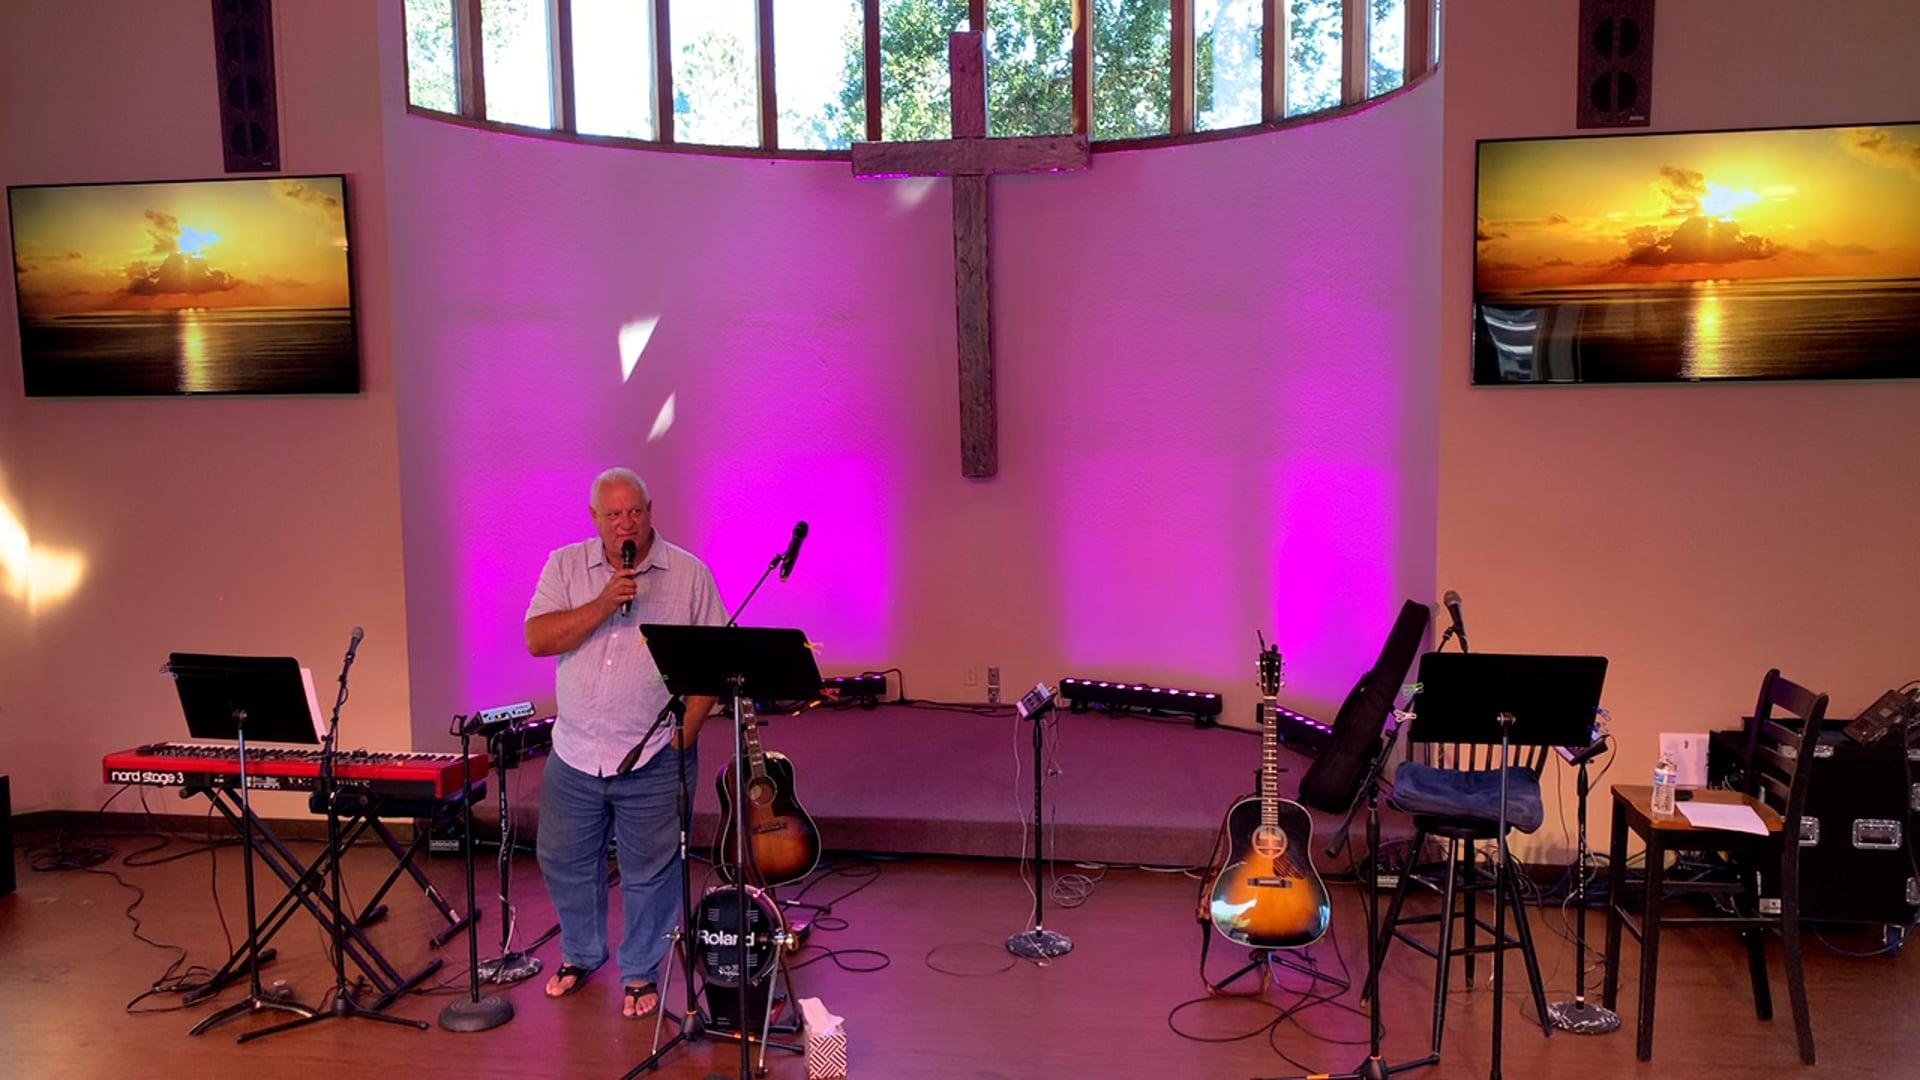 Part 2: Sermon - David Keyes - 19 Sep 2021